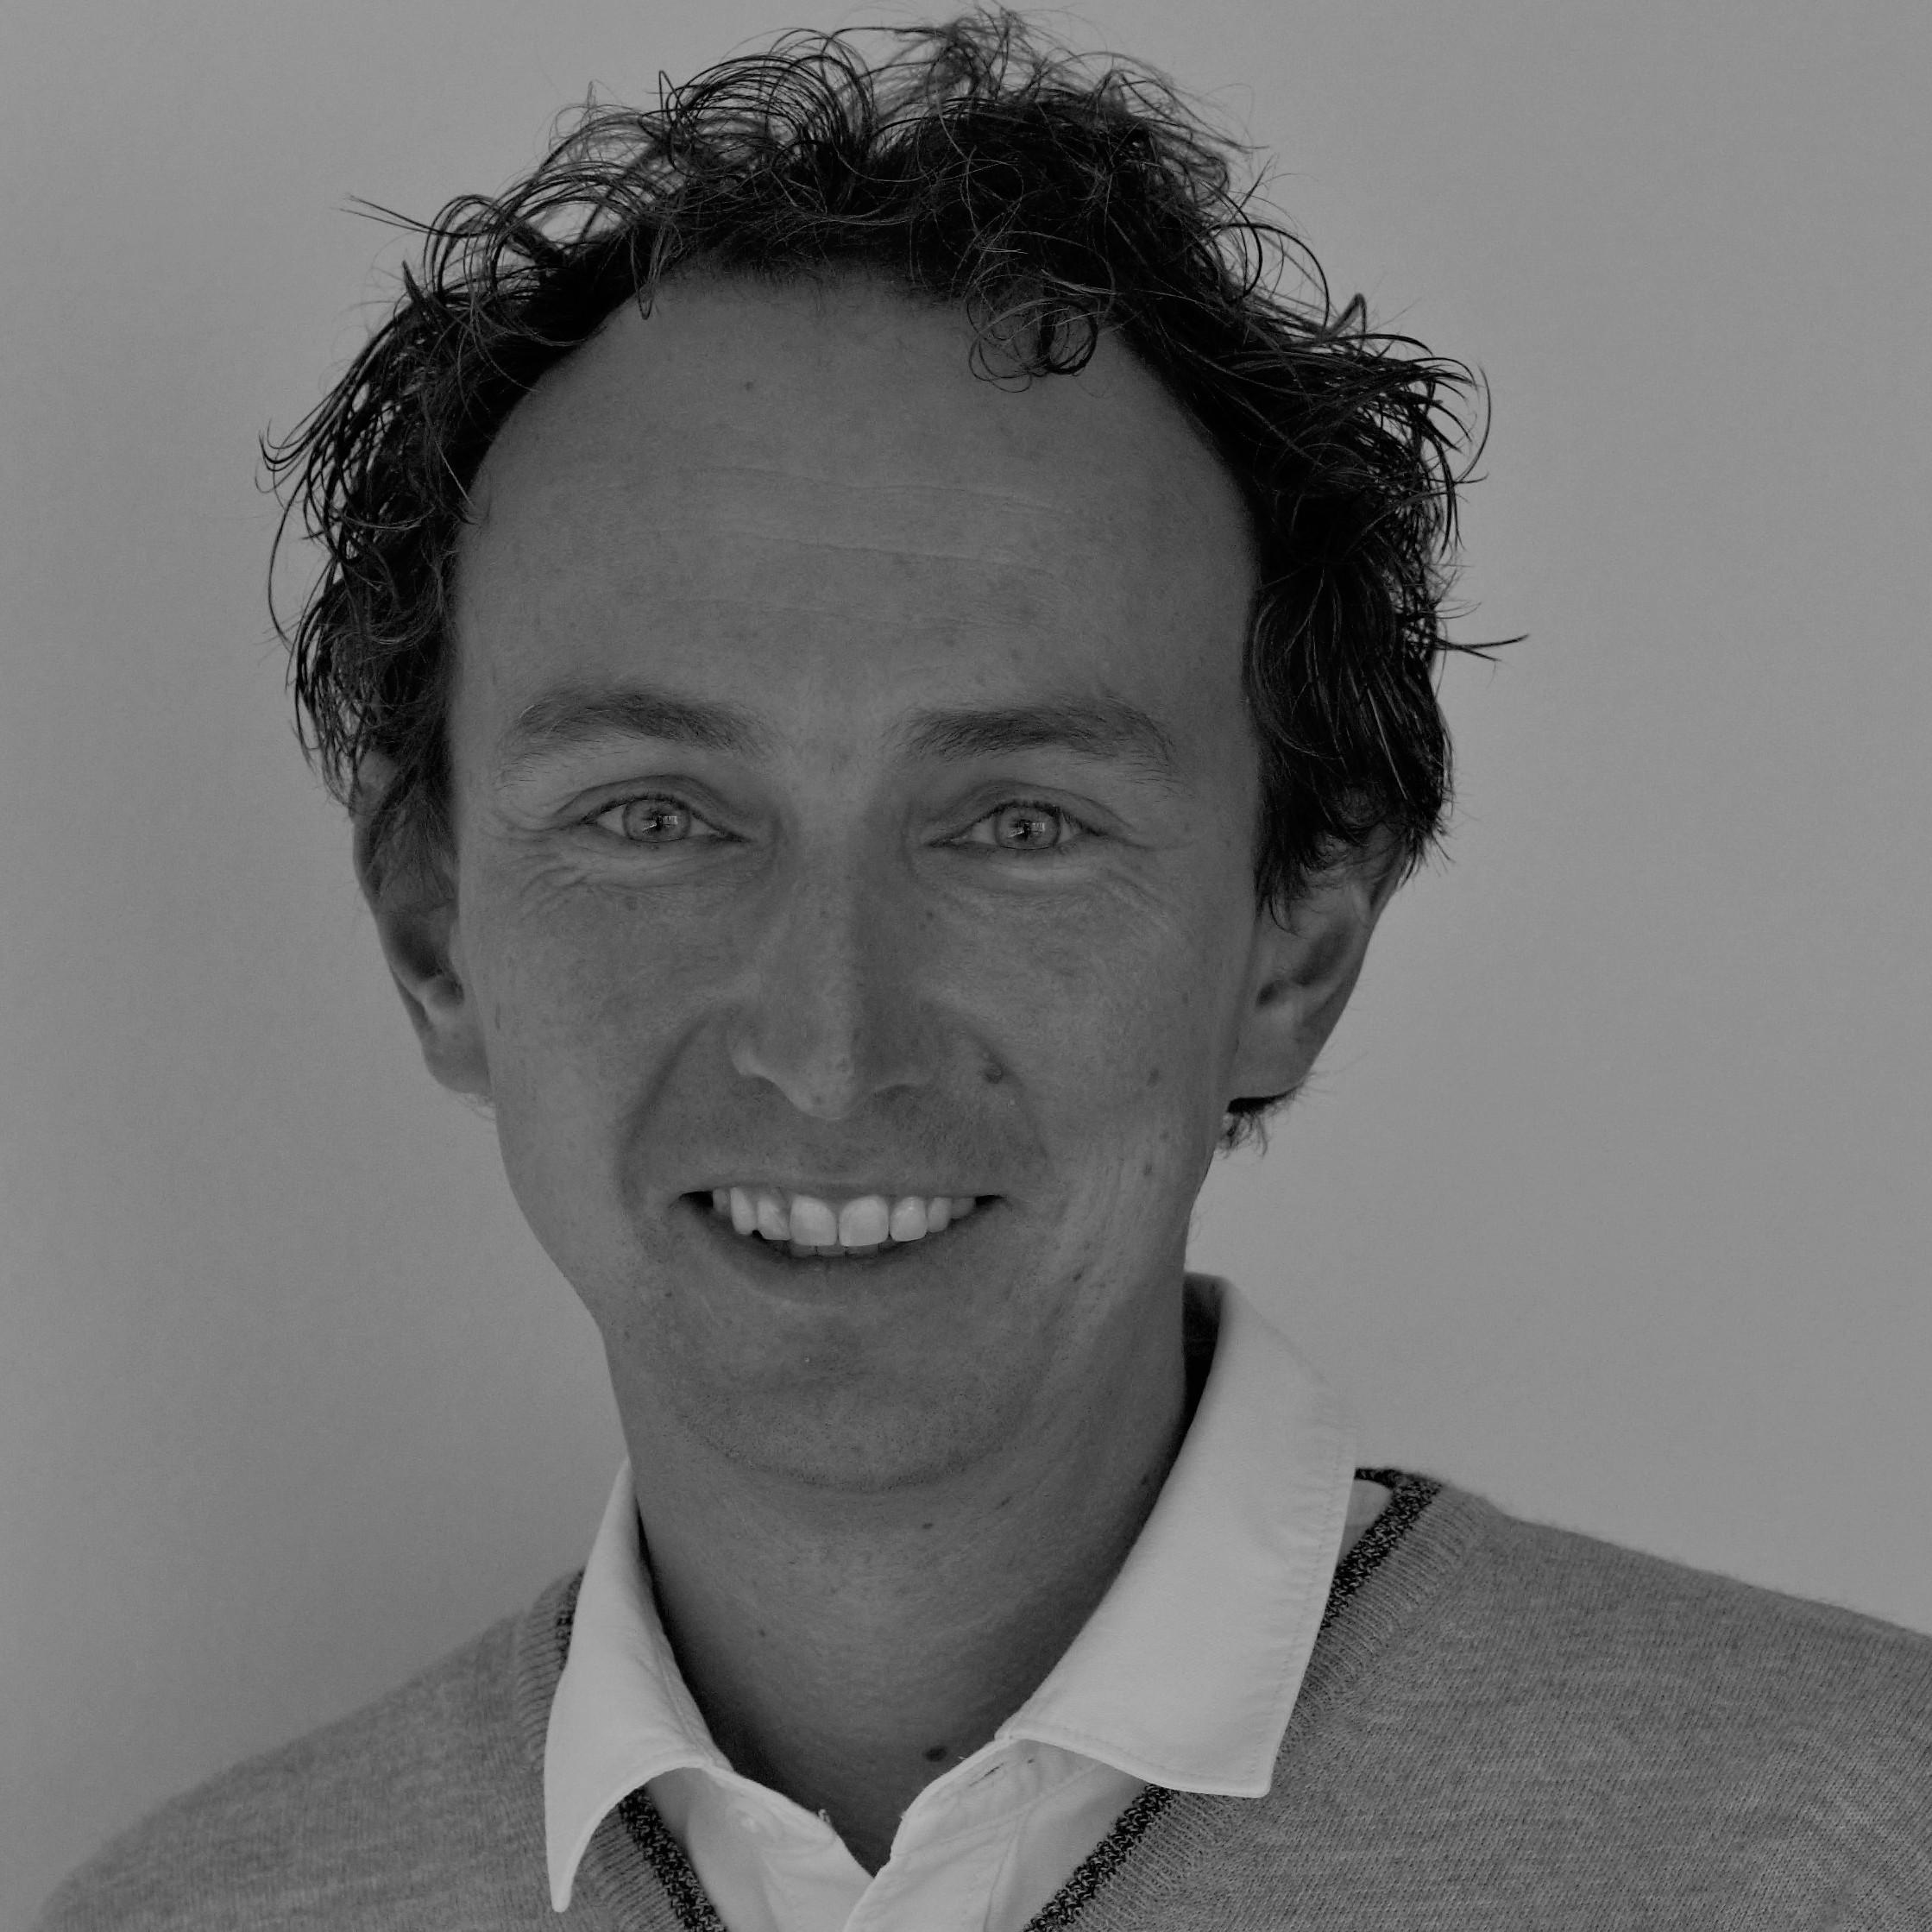 Thomas Vandierendonck